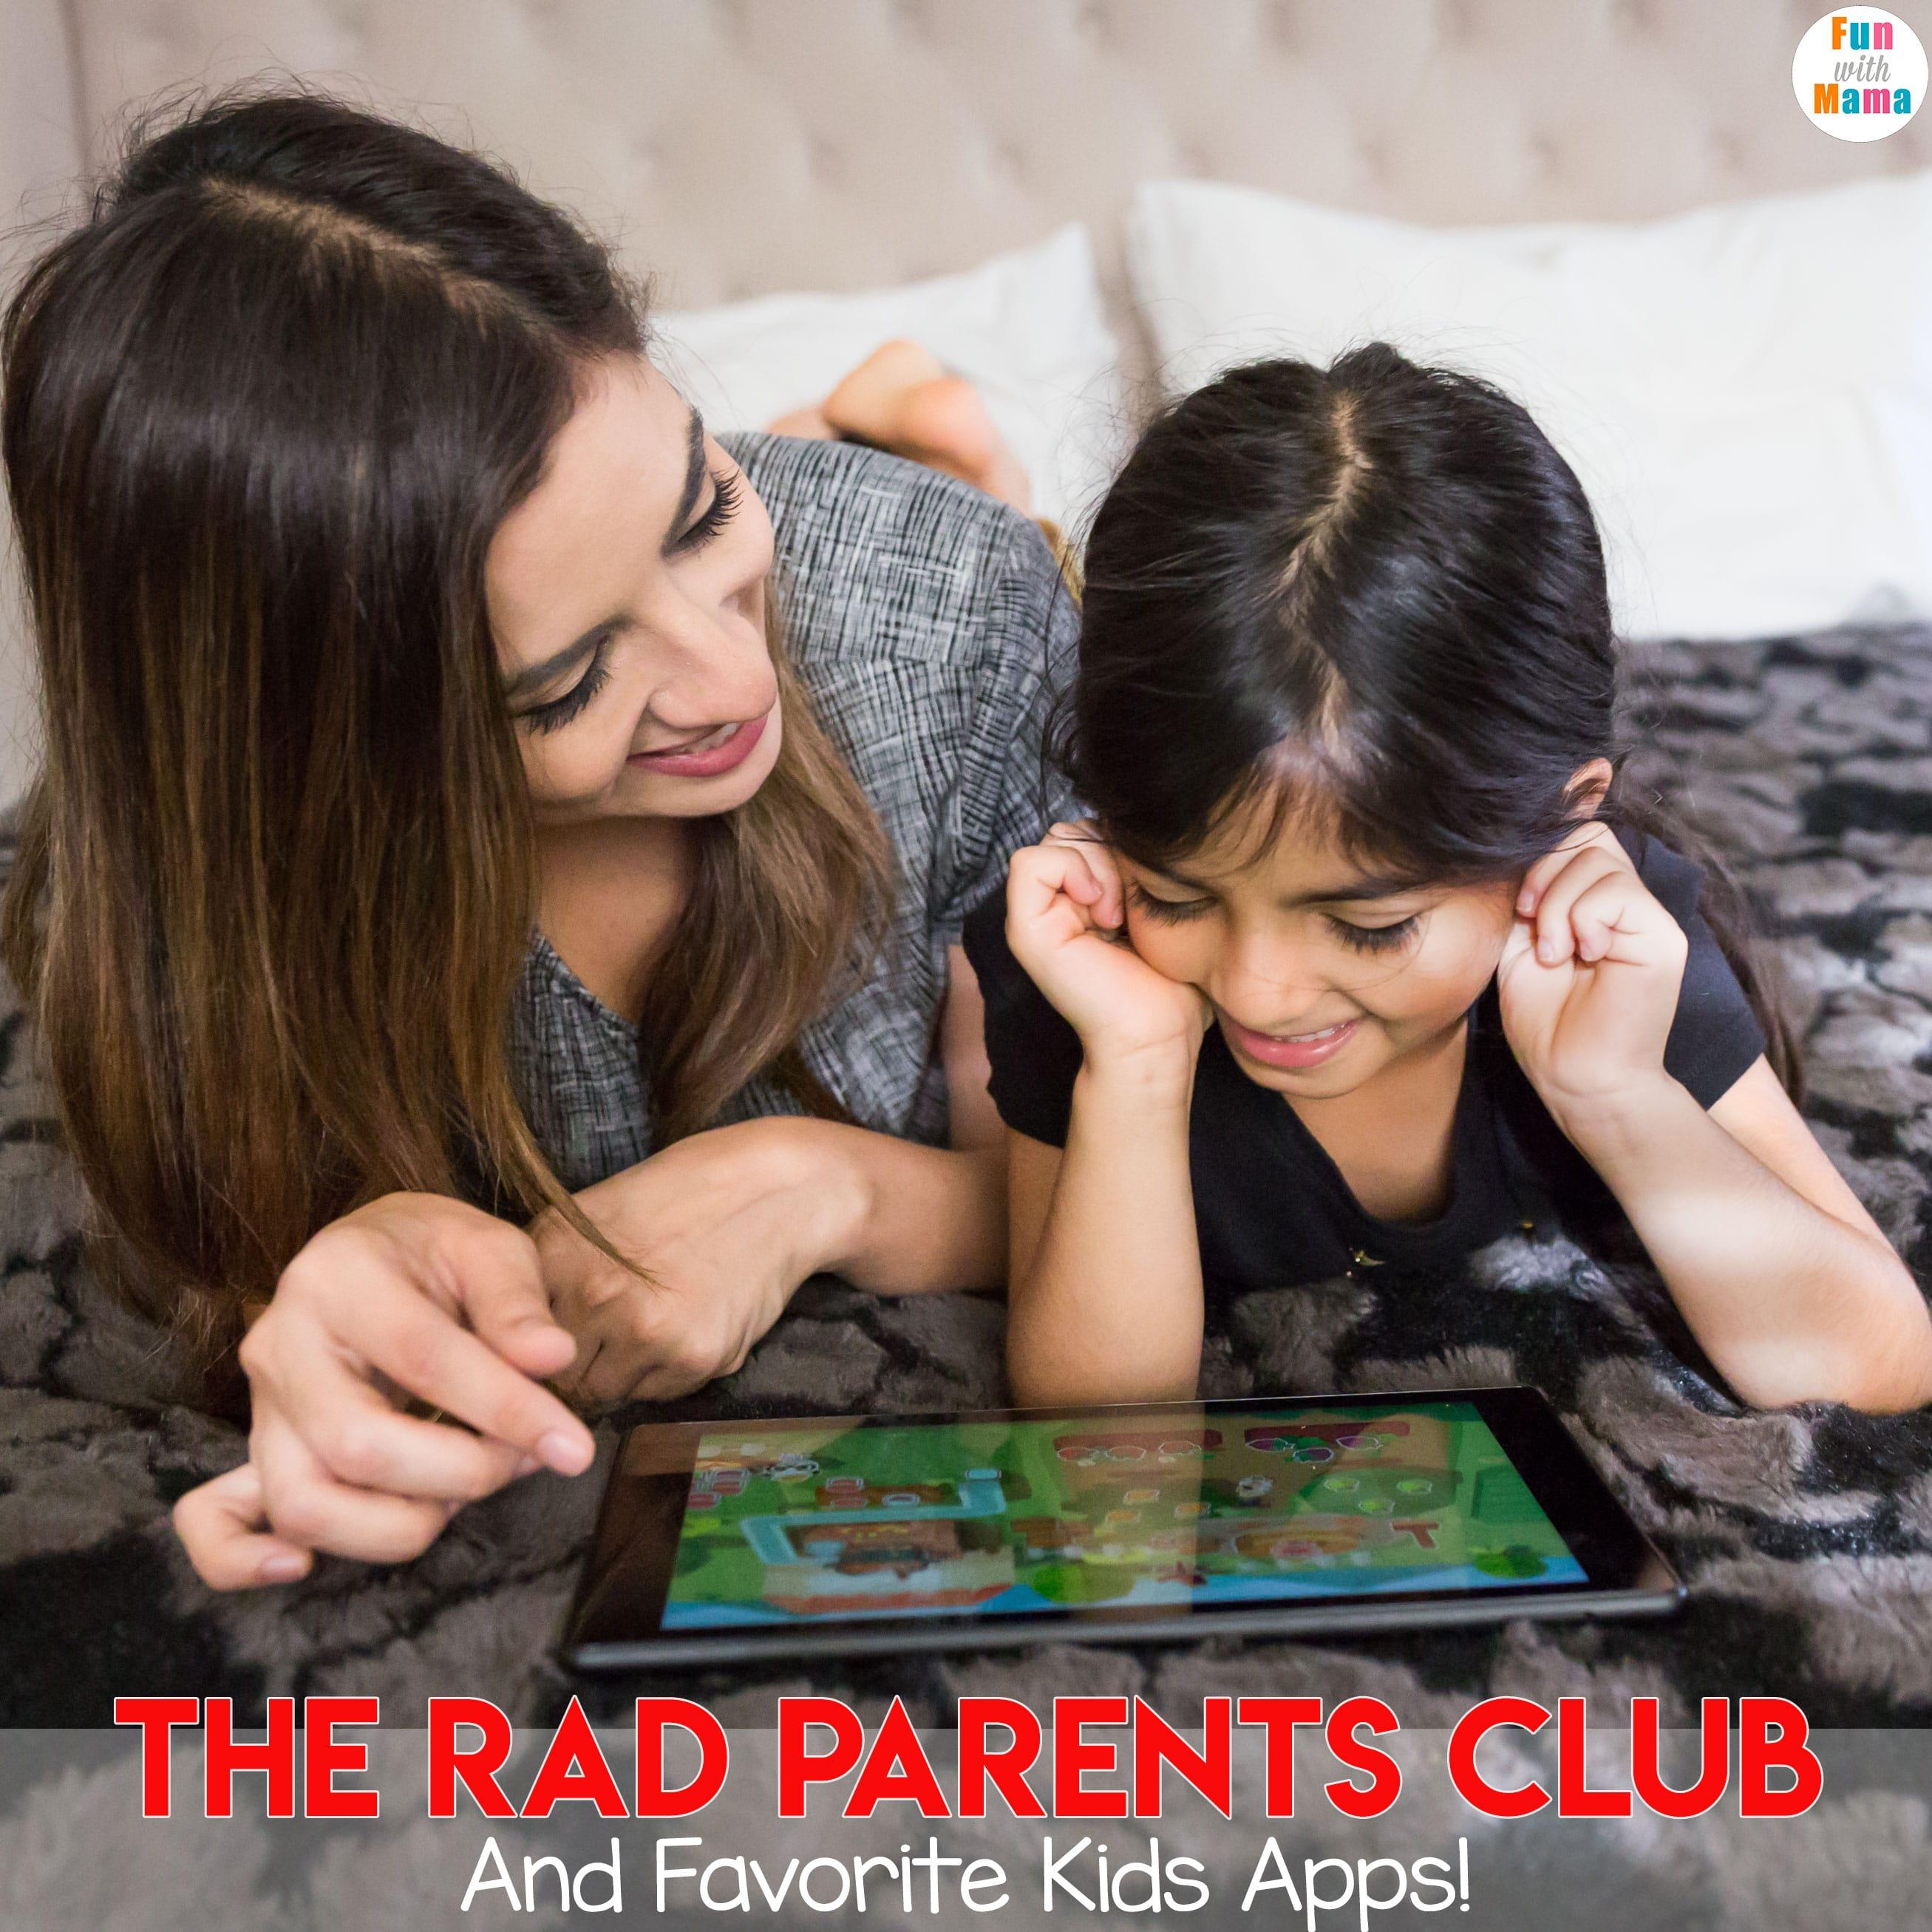 favorite kids apps